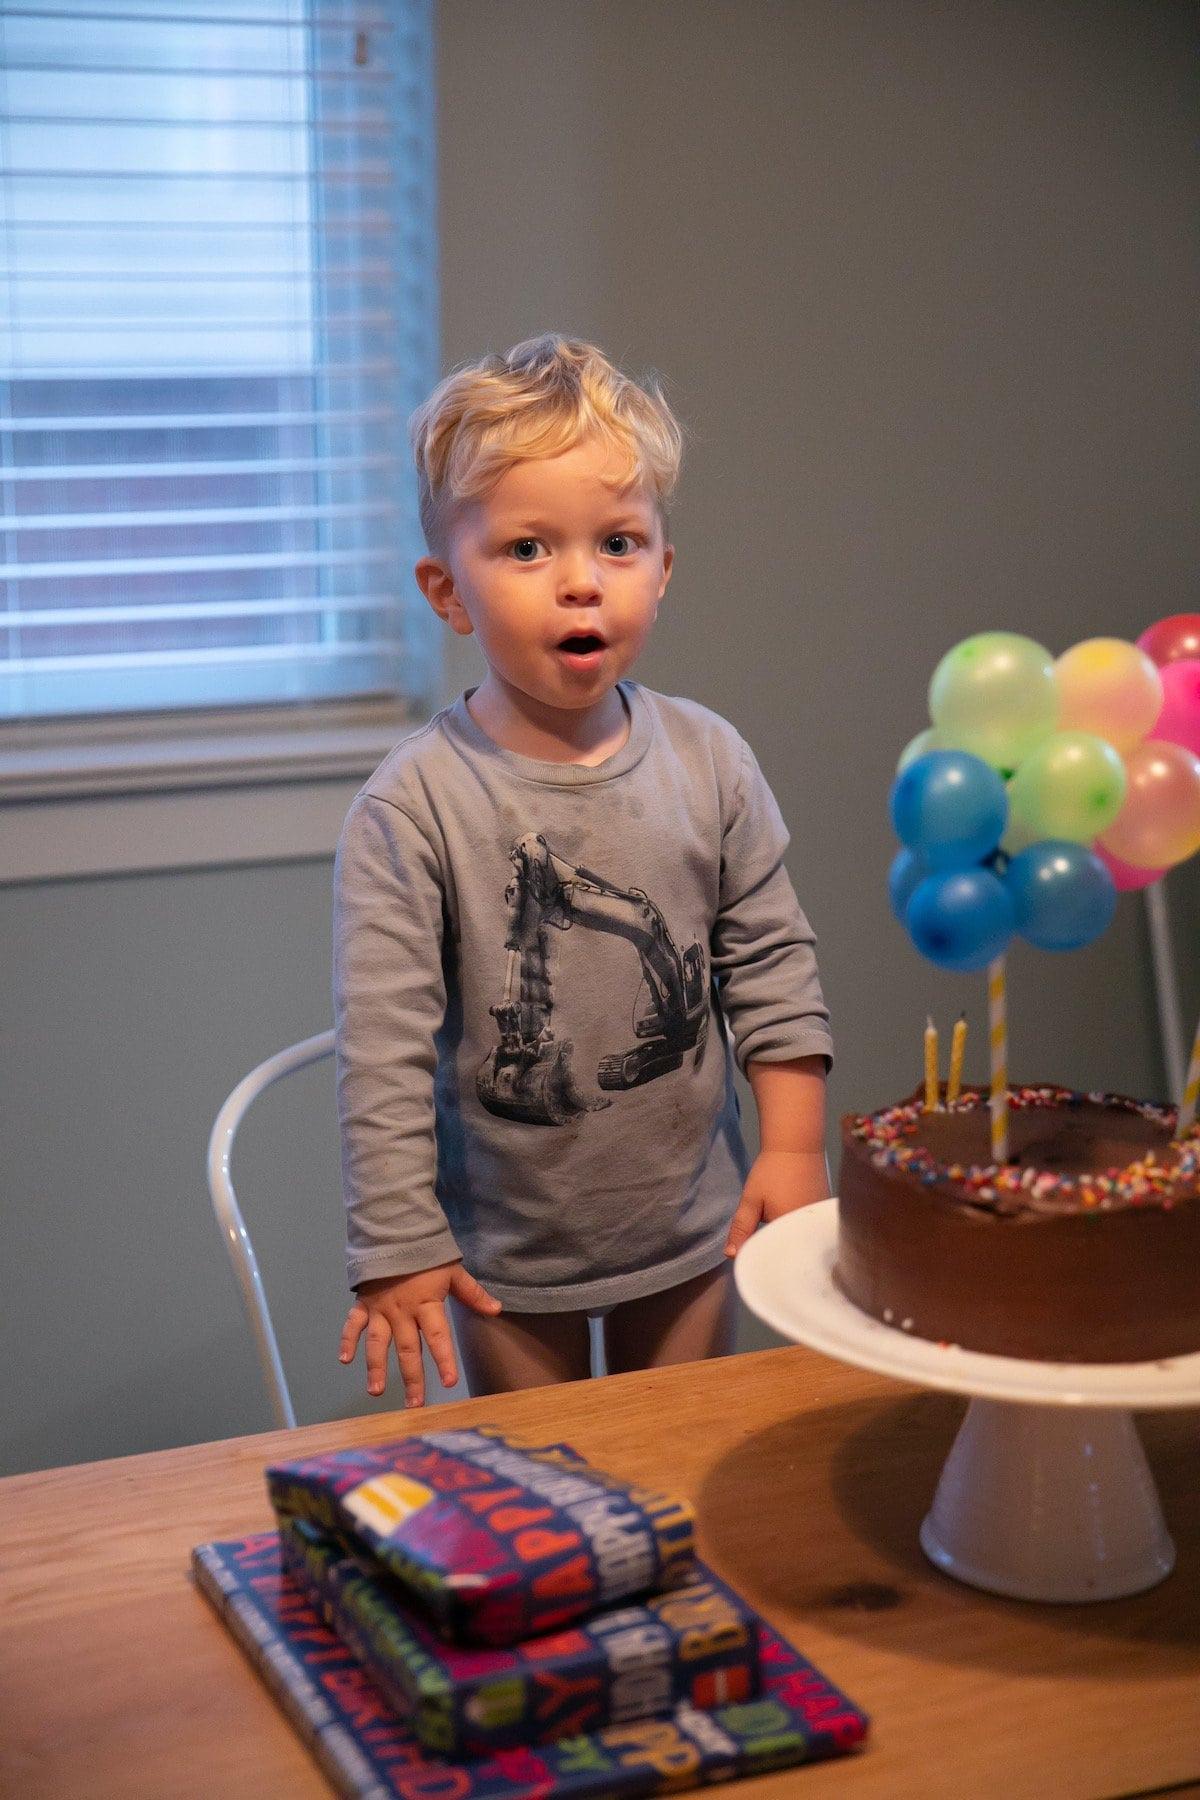 baby with chocolate birthday cake